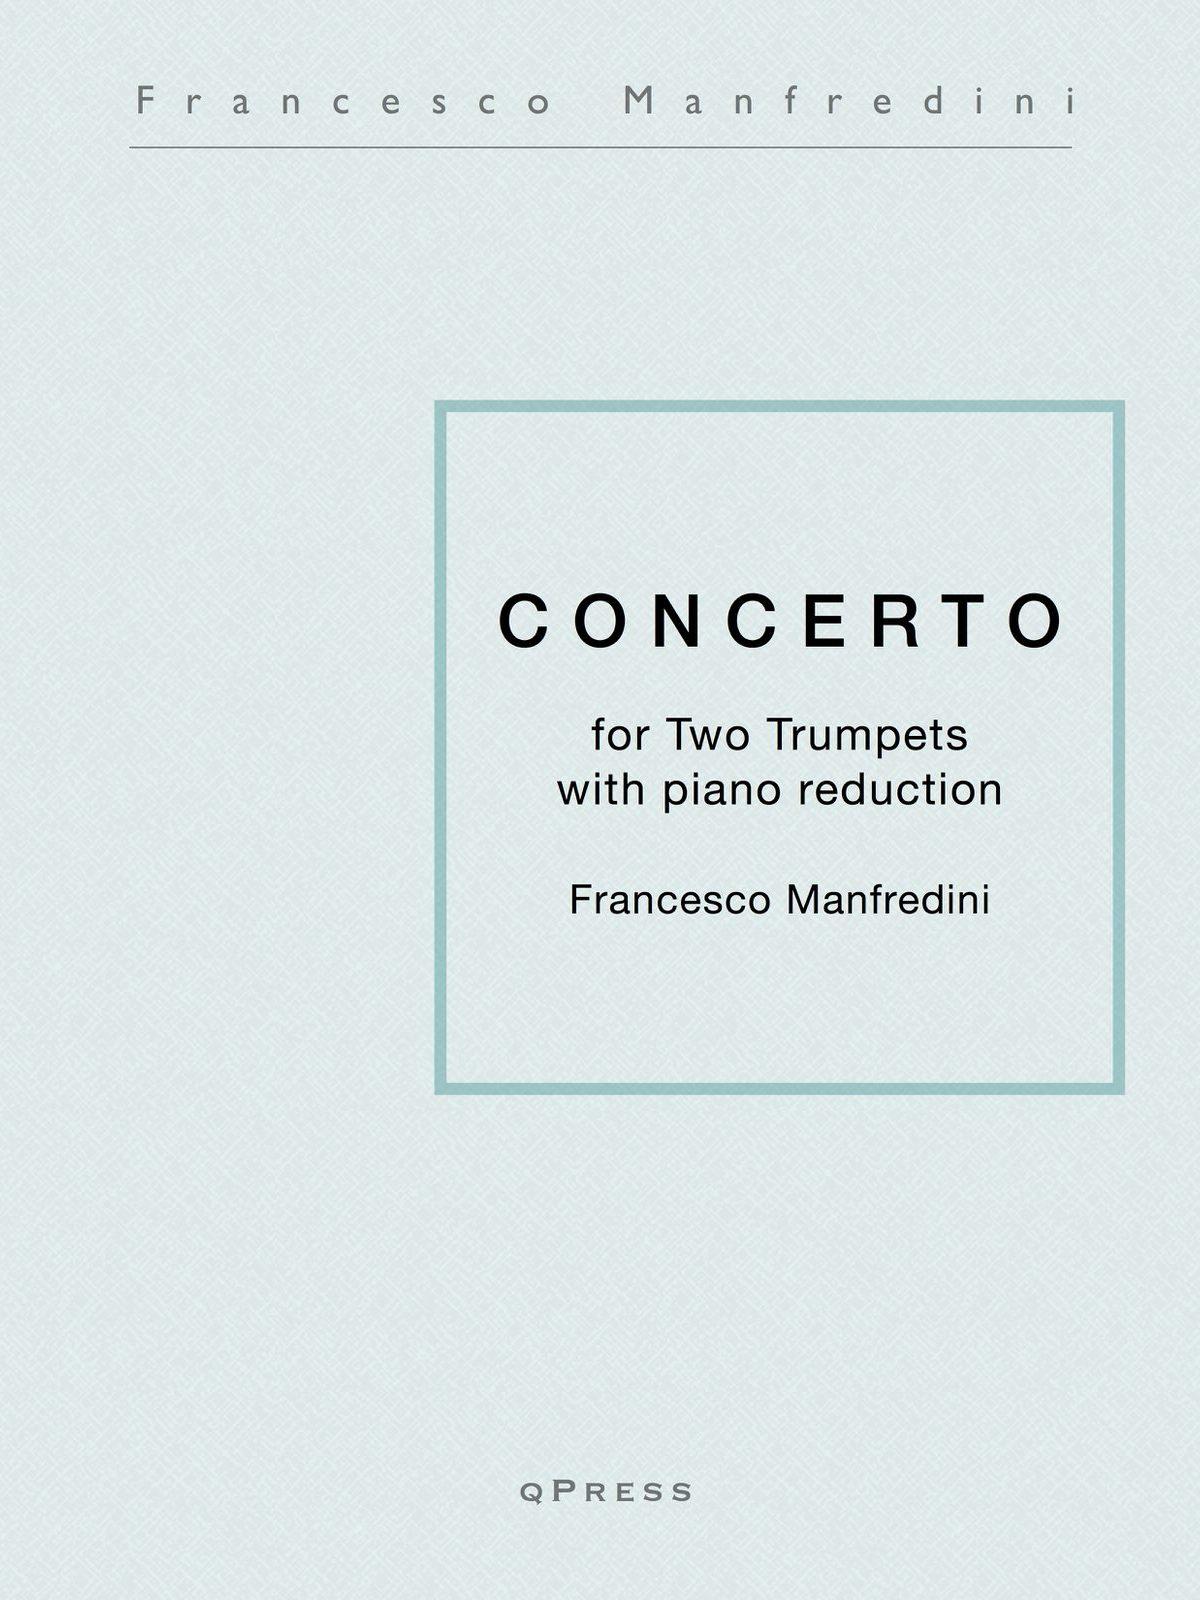 Manfredini, Concerto for Two Trumpets (Score and Parts)-p01